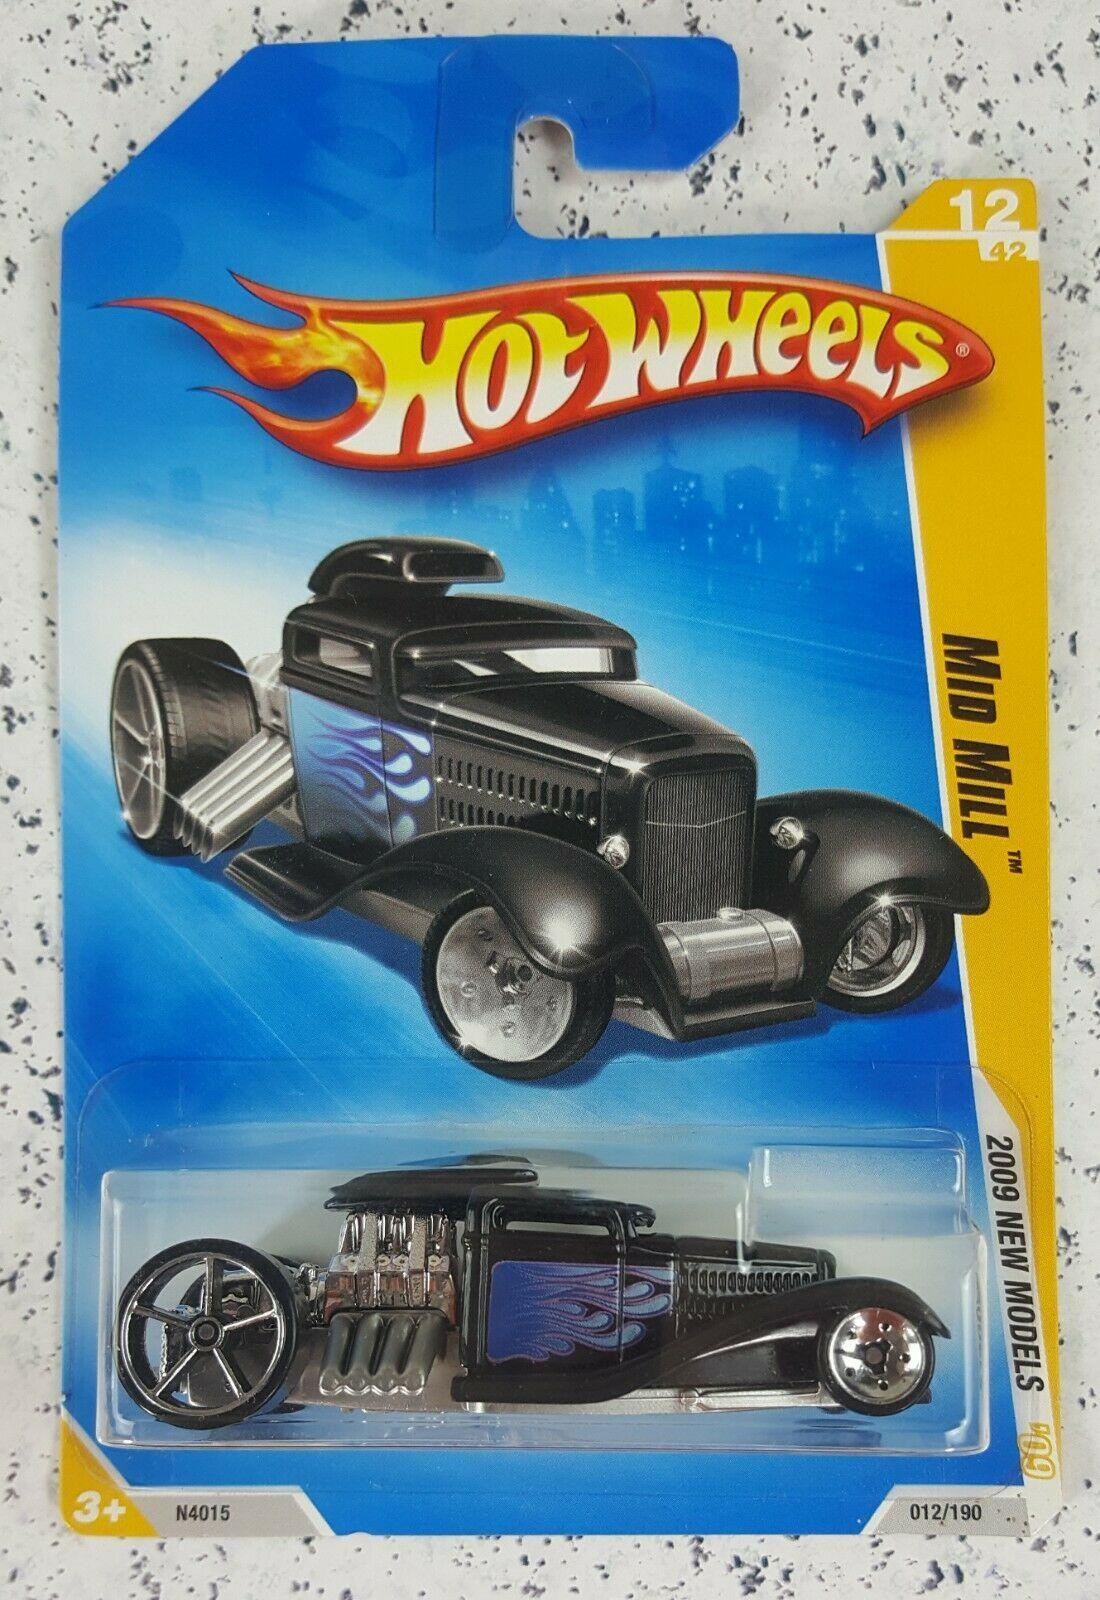 Hot Wheels 1:64 2009 New Models Mid Mill 12/42 12/190 - $8.99